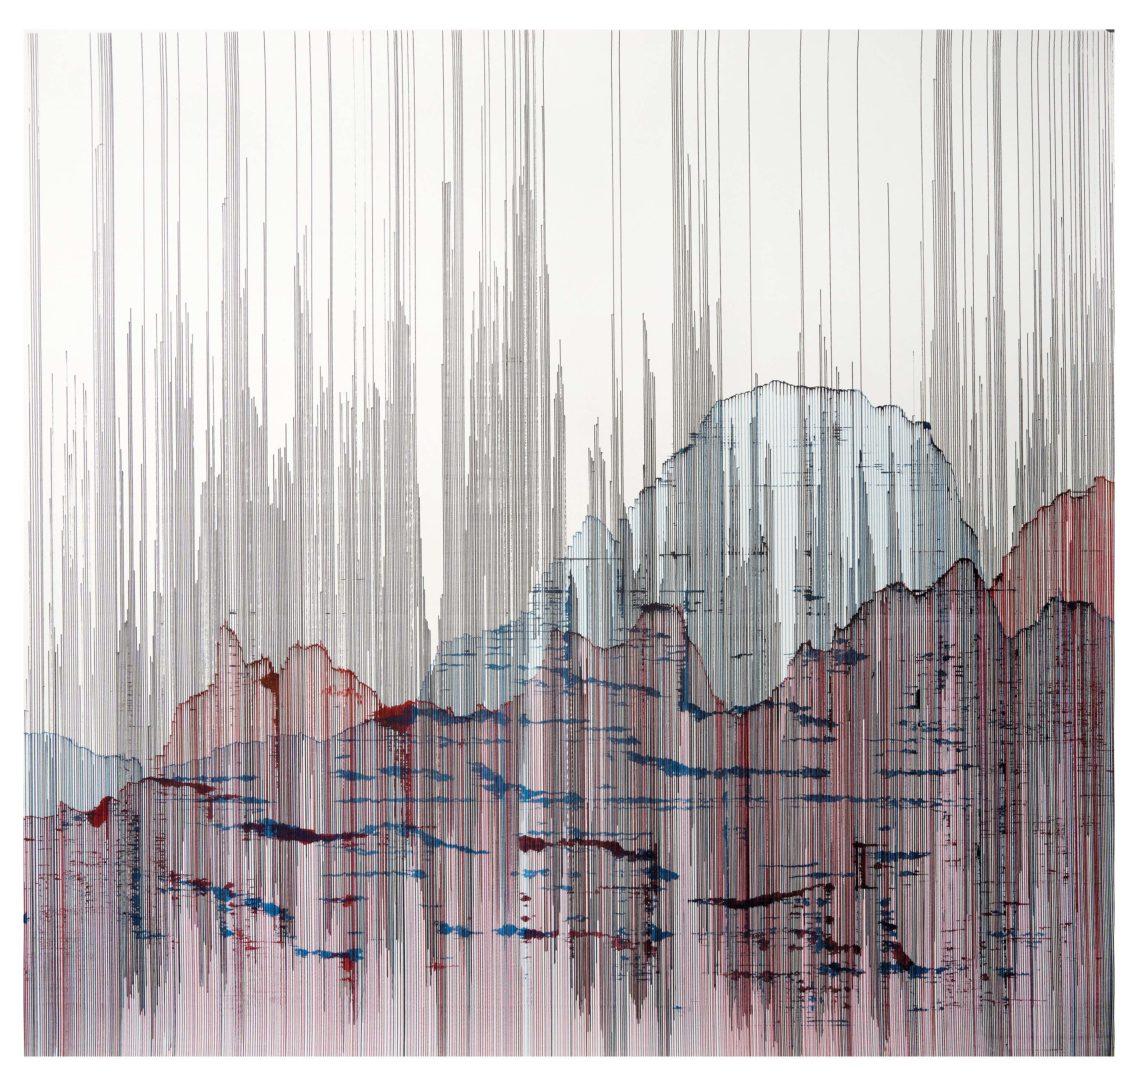 Op.260519 ink on paper, 107x100cm